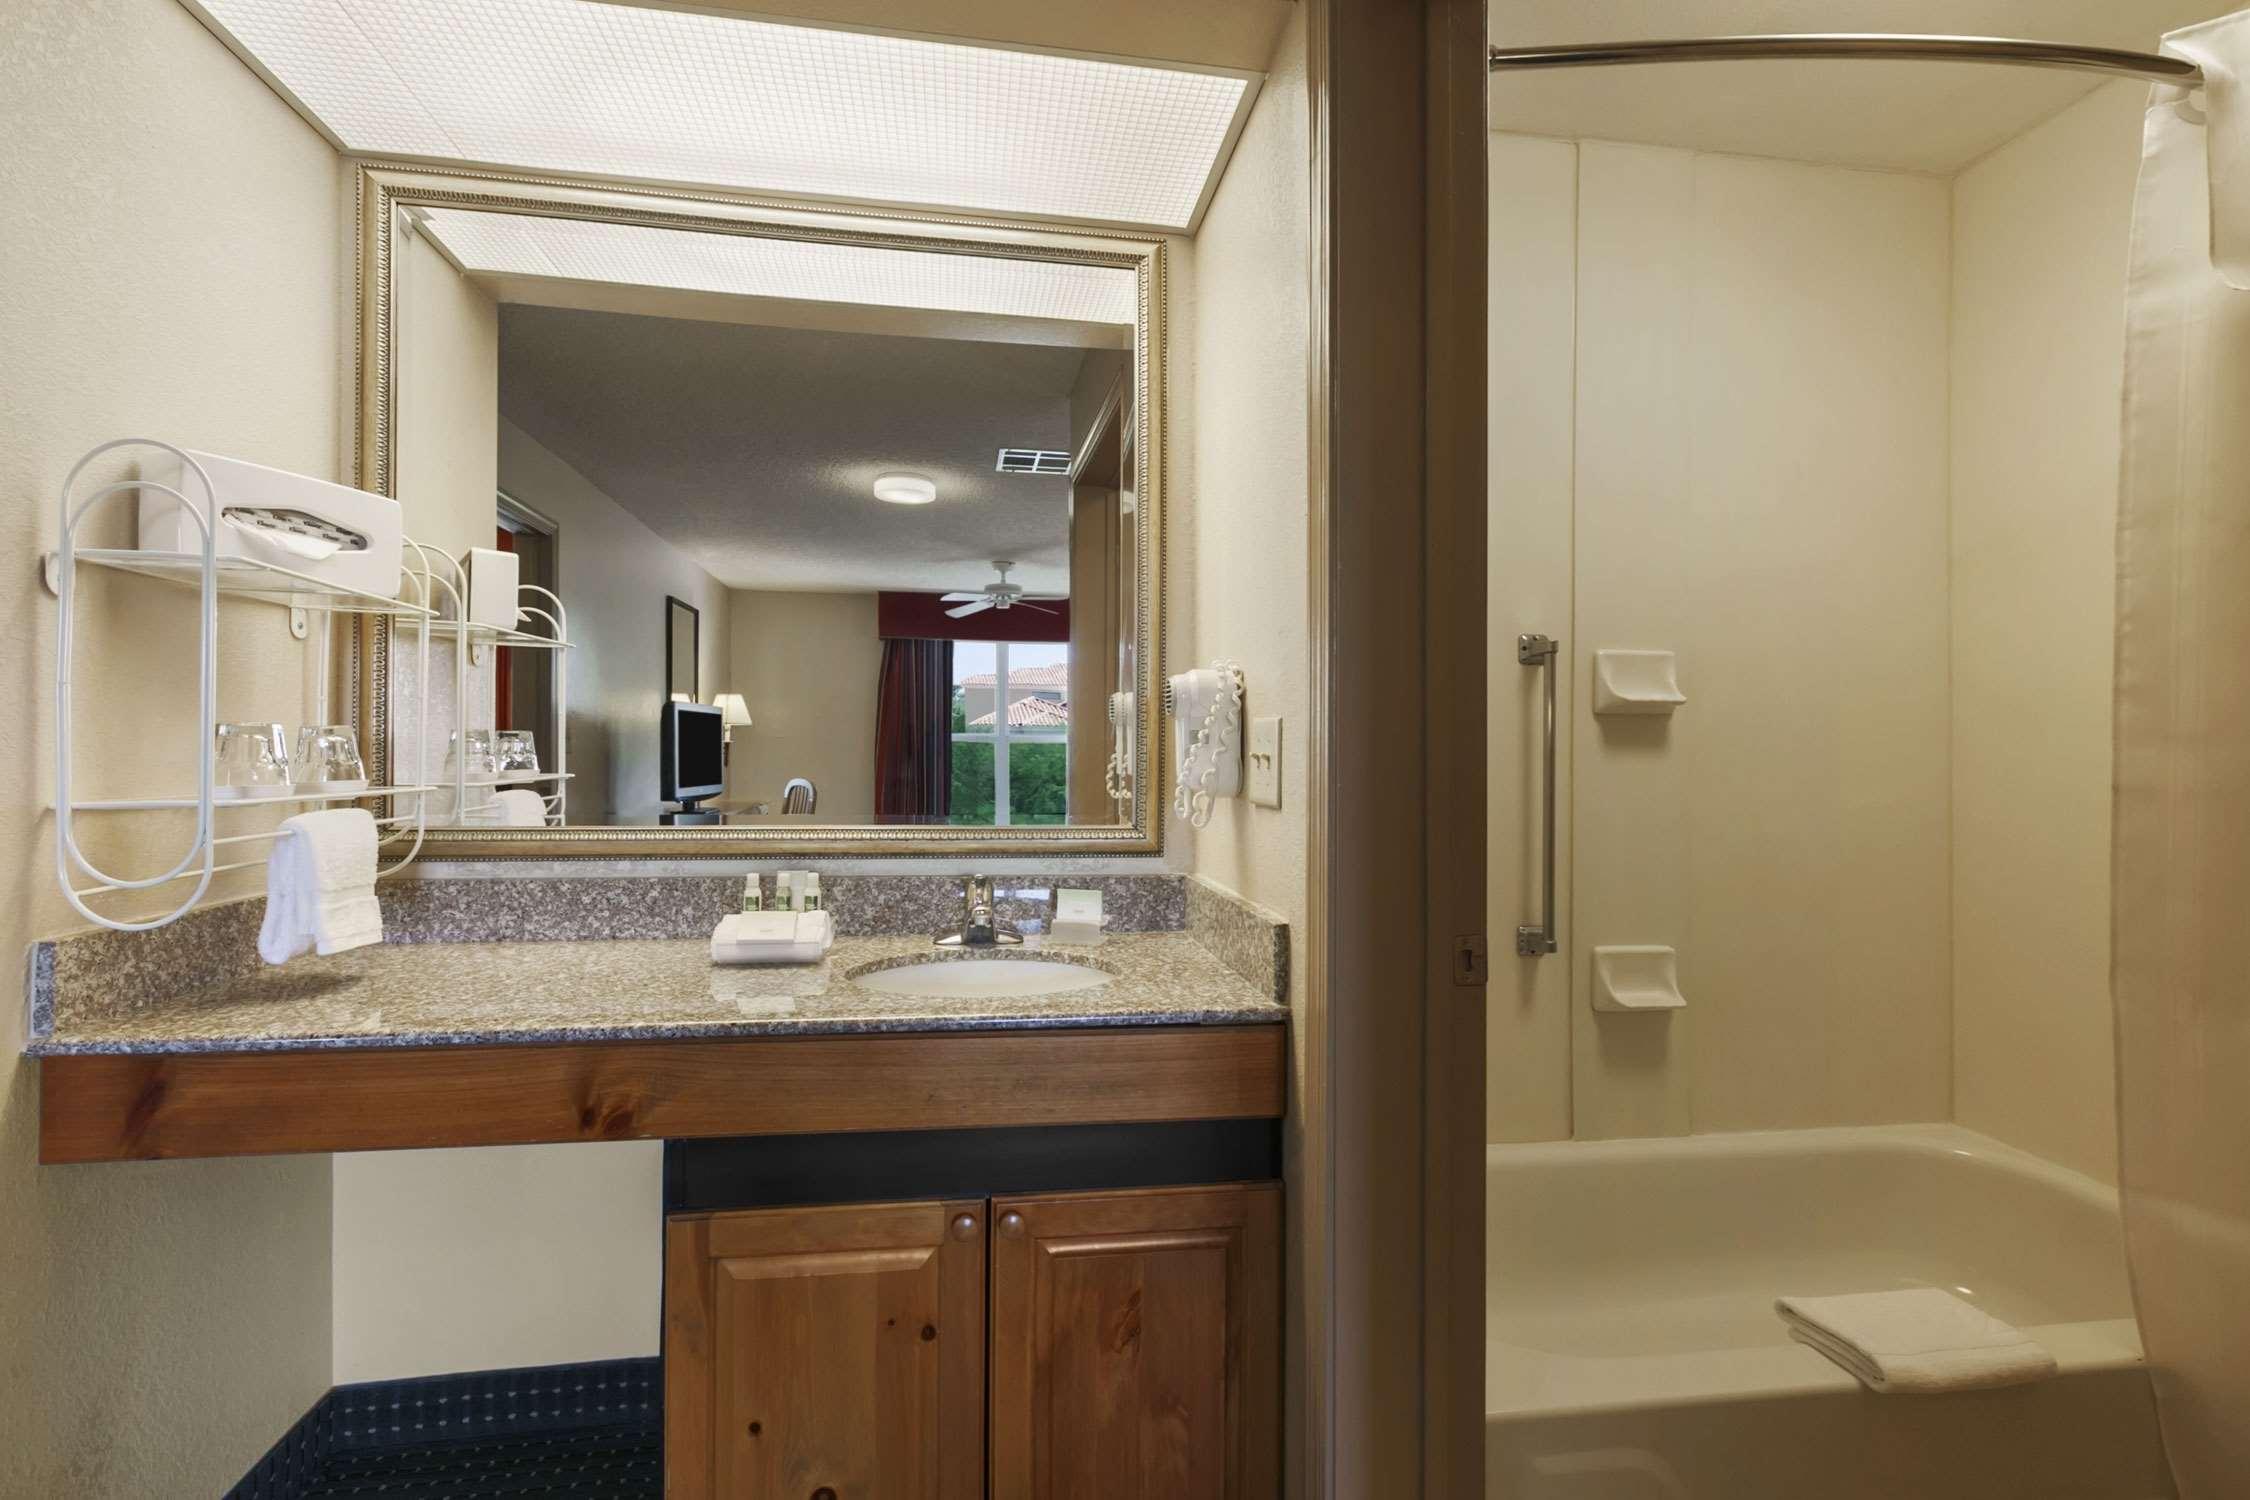 Homewood Suites by Hilton Phoenix/Scottsdale image 14